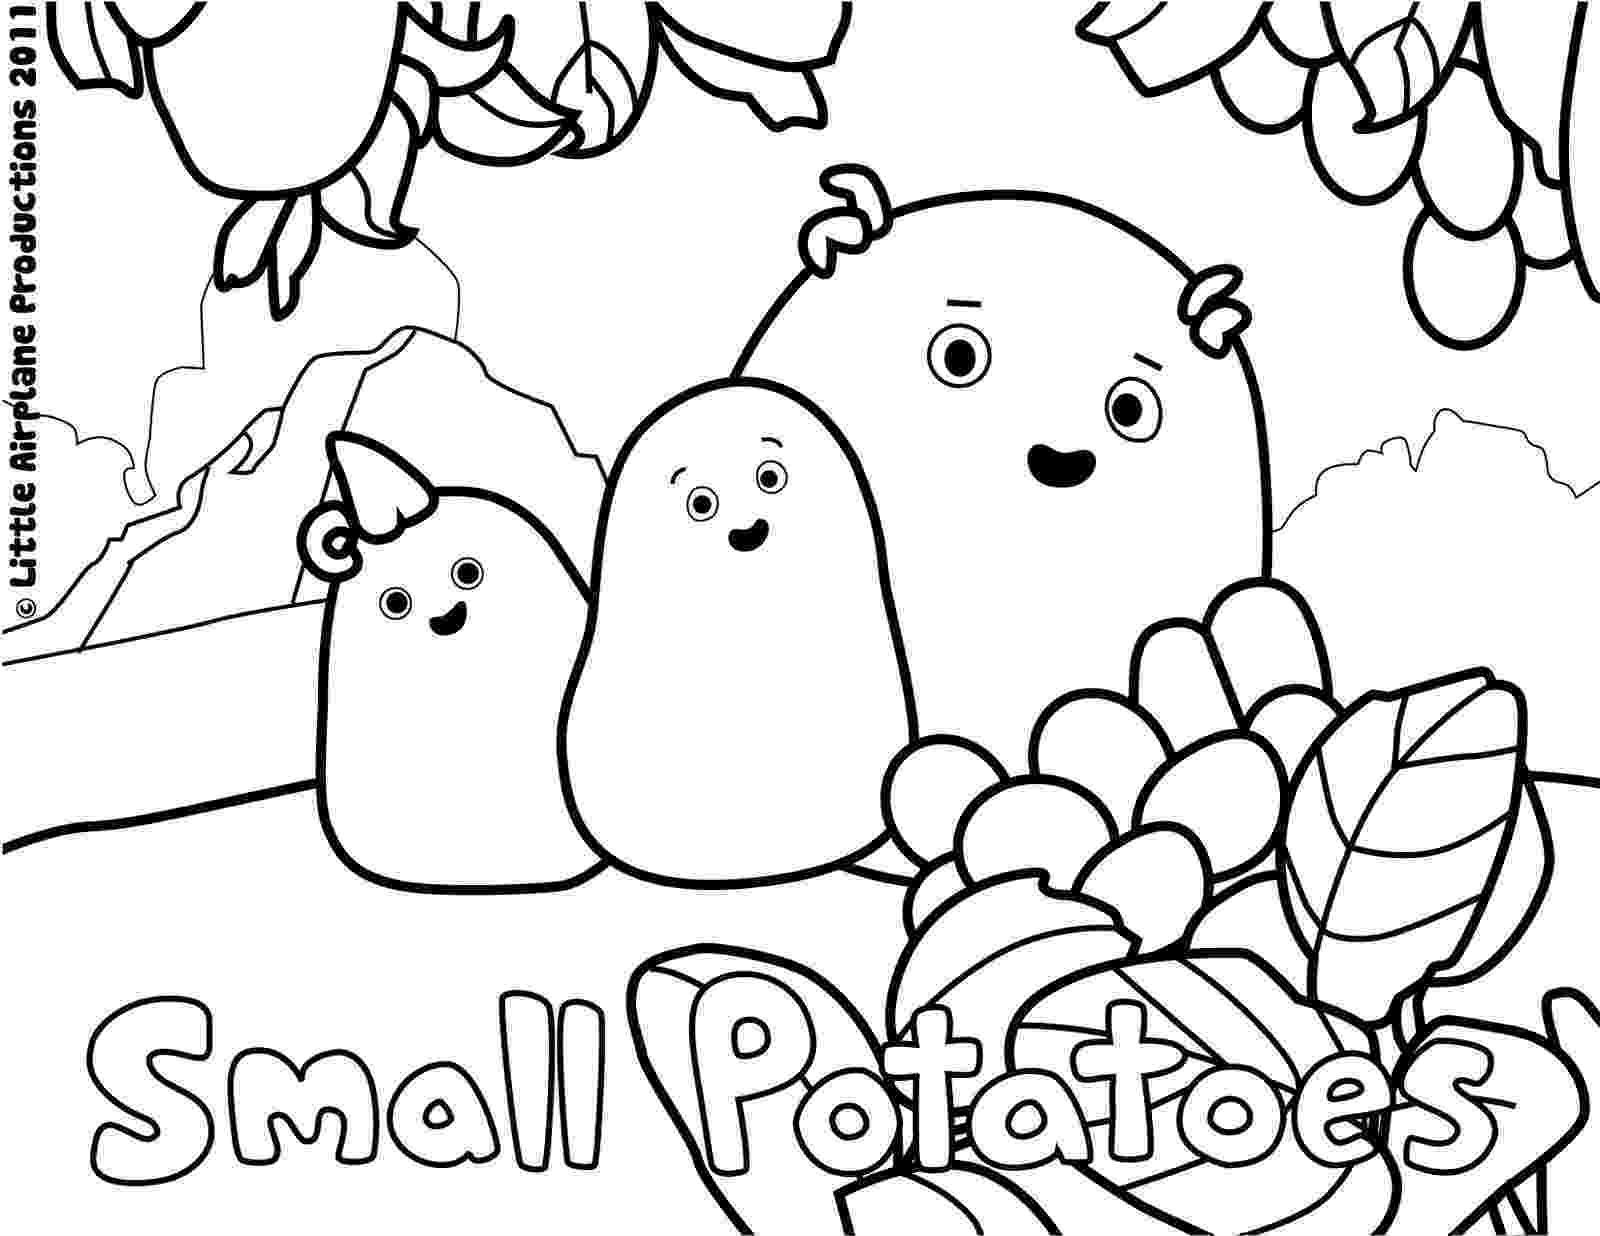 potato pictures for colouring healthy potato coloring page download free healthy pictures for potato colouring